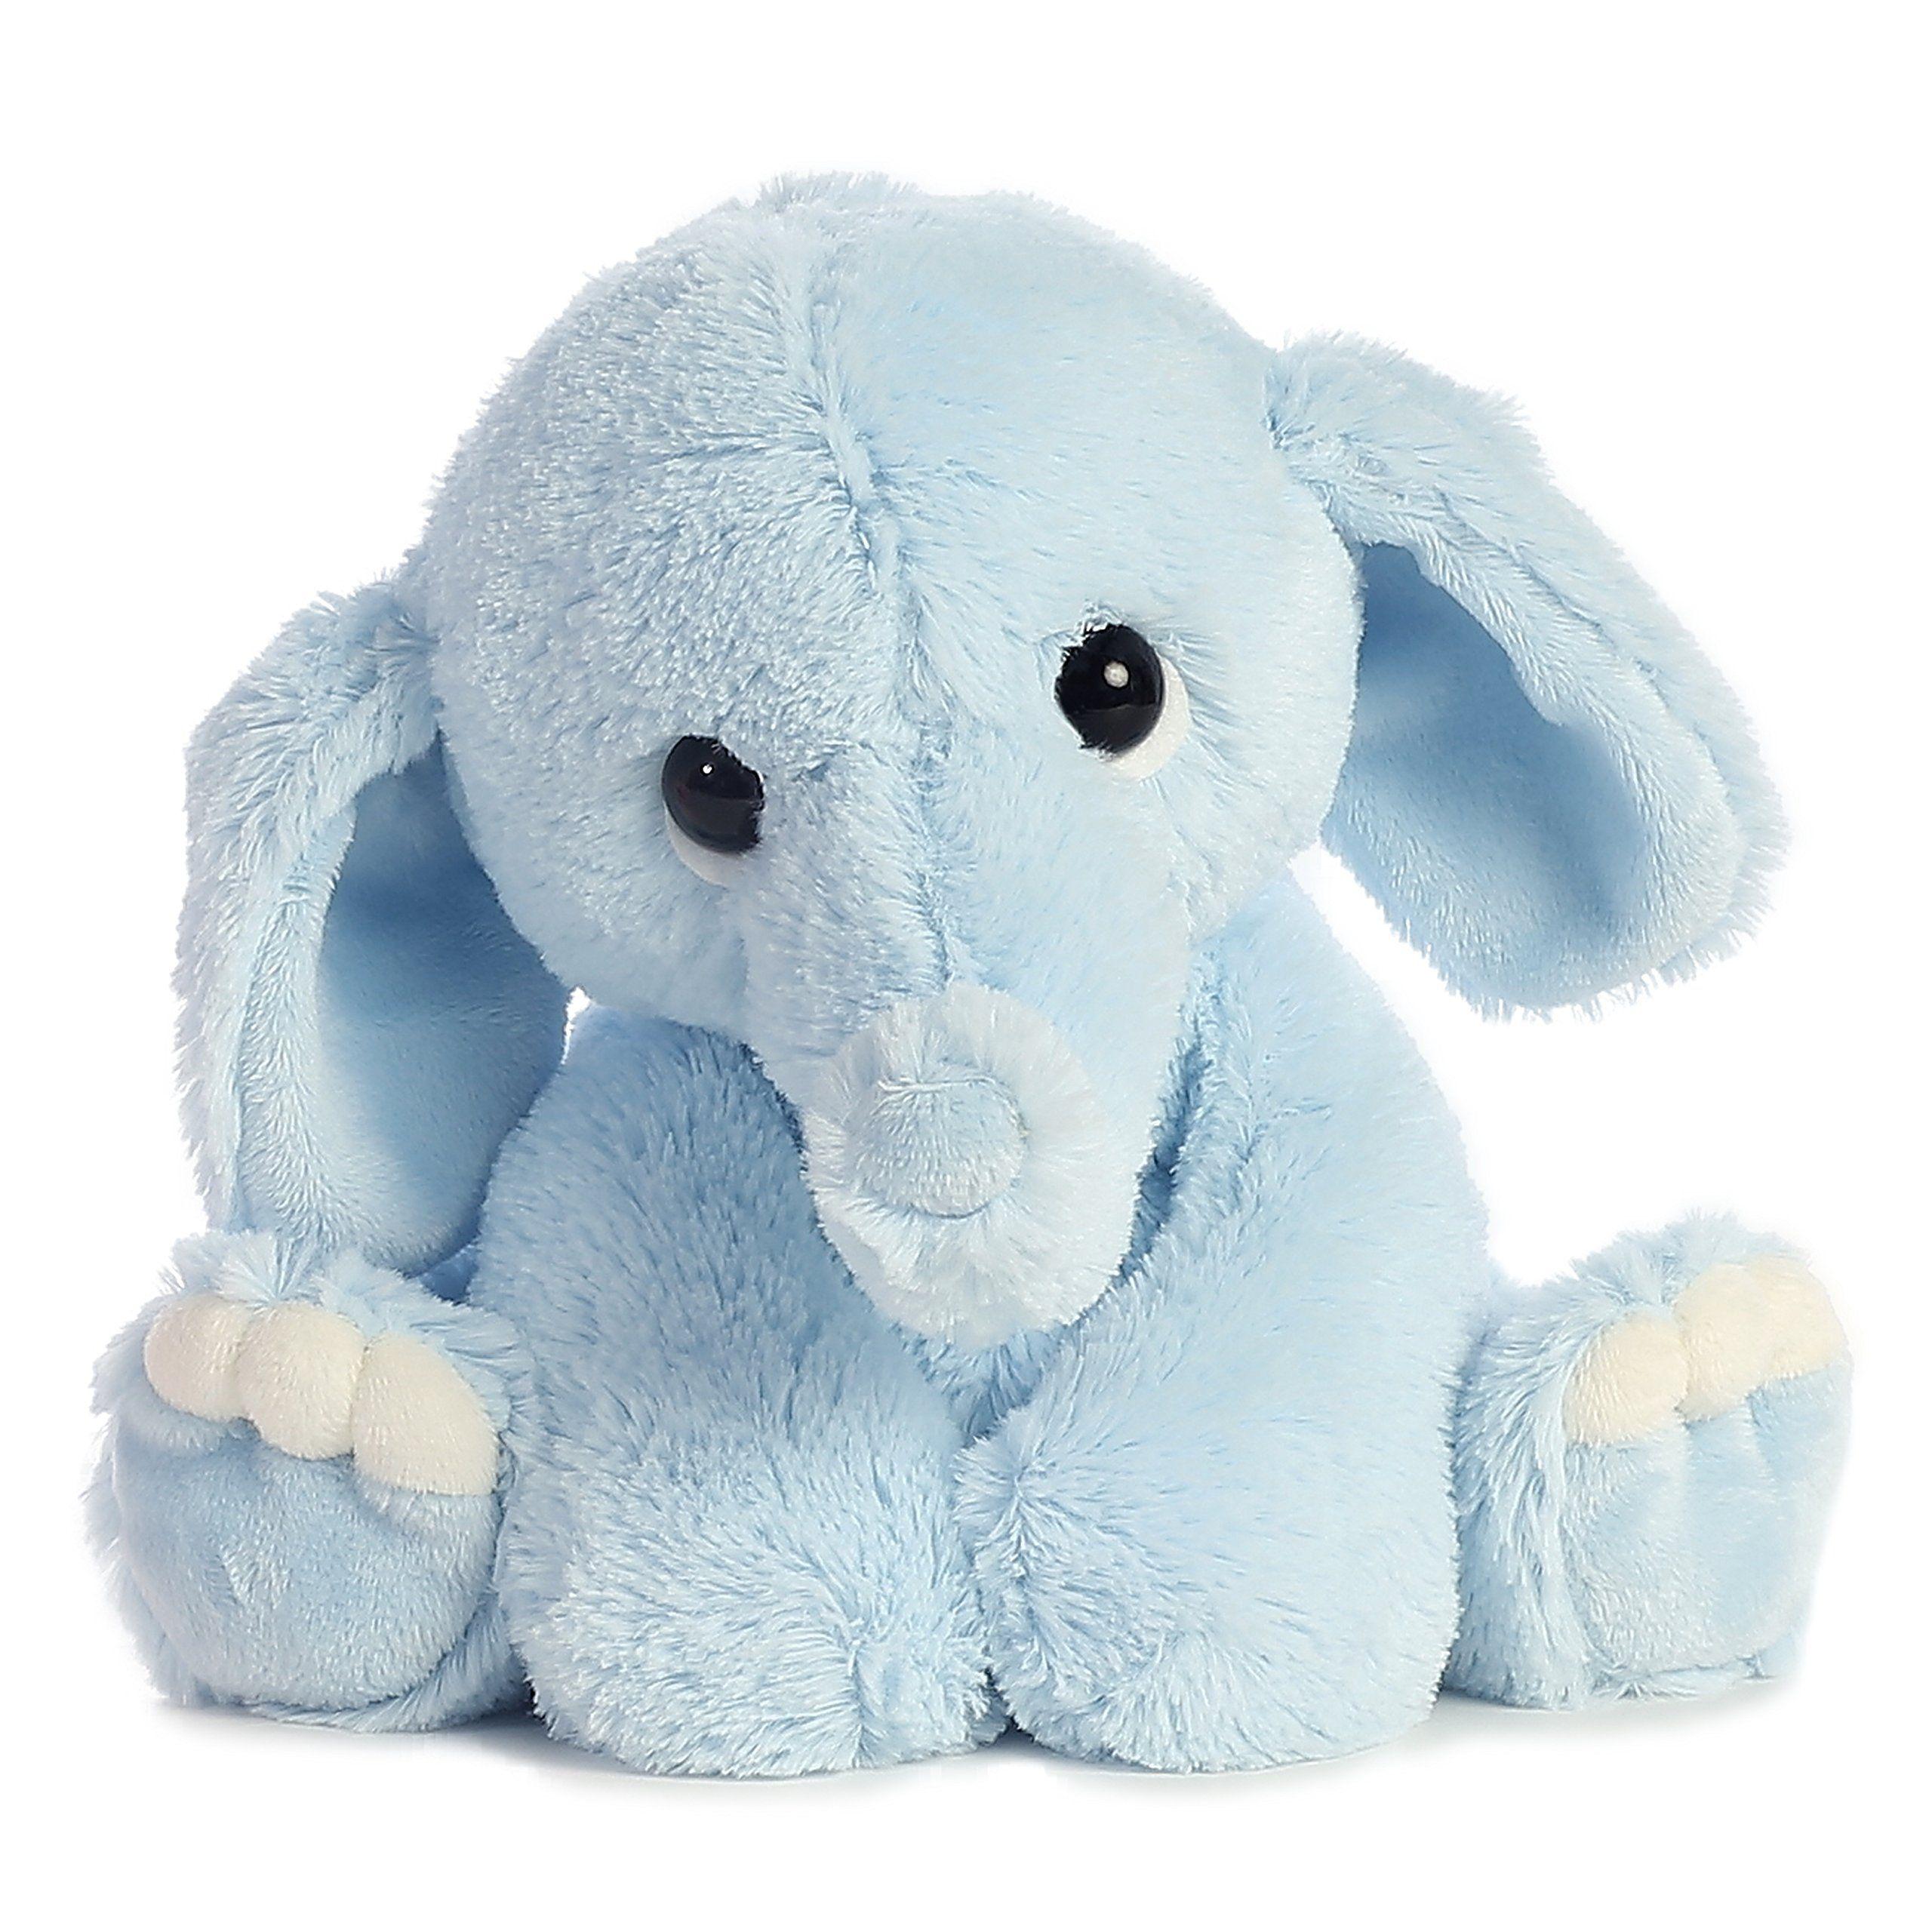 Predownload: Amazon Com Aurora 0 World Lil Benny Phant Blue Plush Toys Games Elephant Stuffed Animal Blue Stuffed Animals Plush Stuffed Animals [ 2560 x 2560 Pixel ]